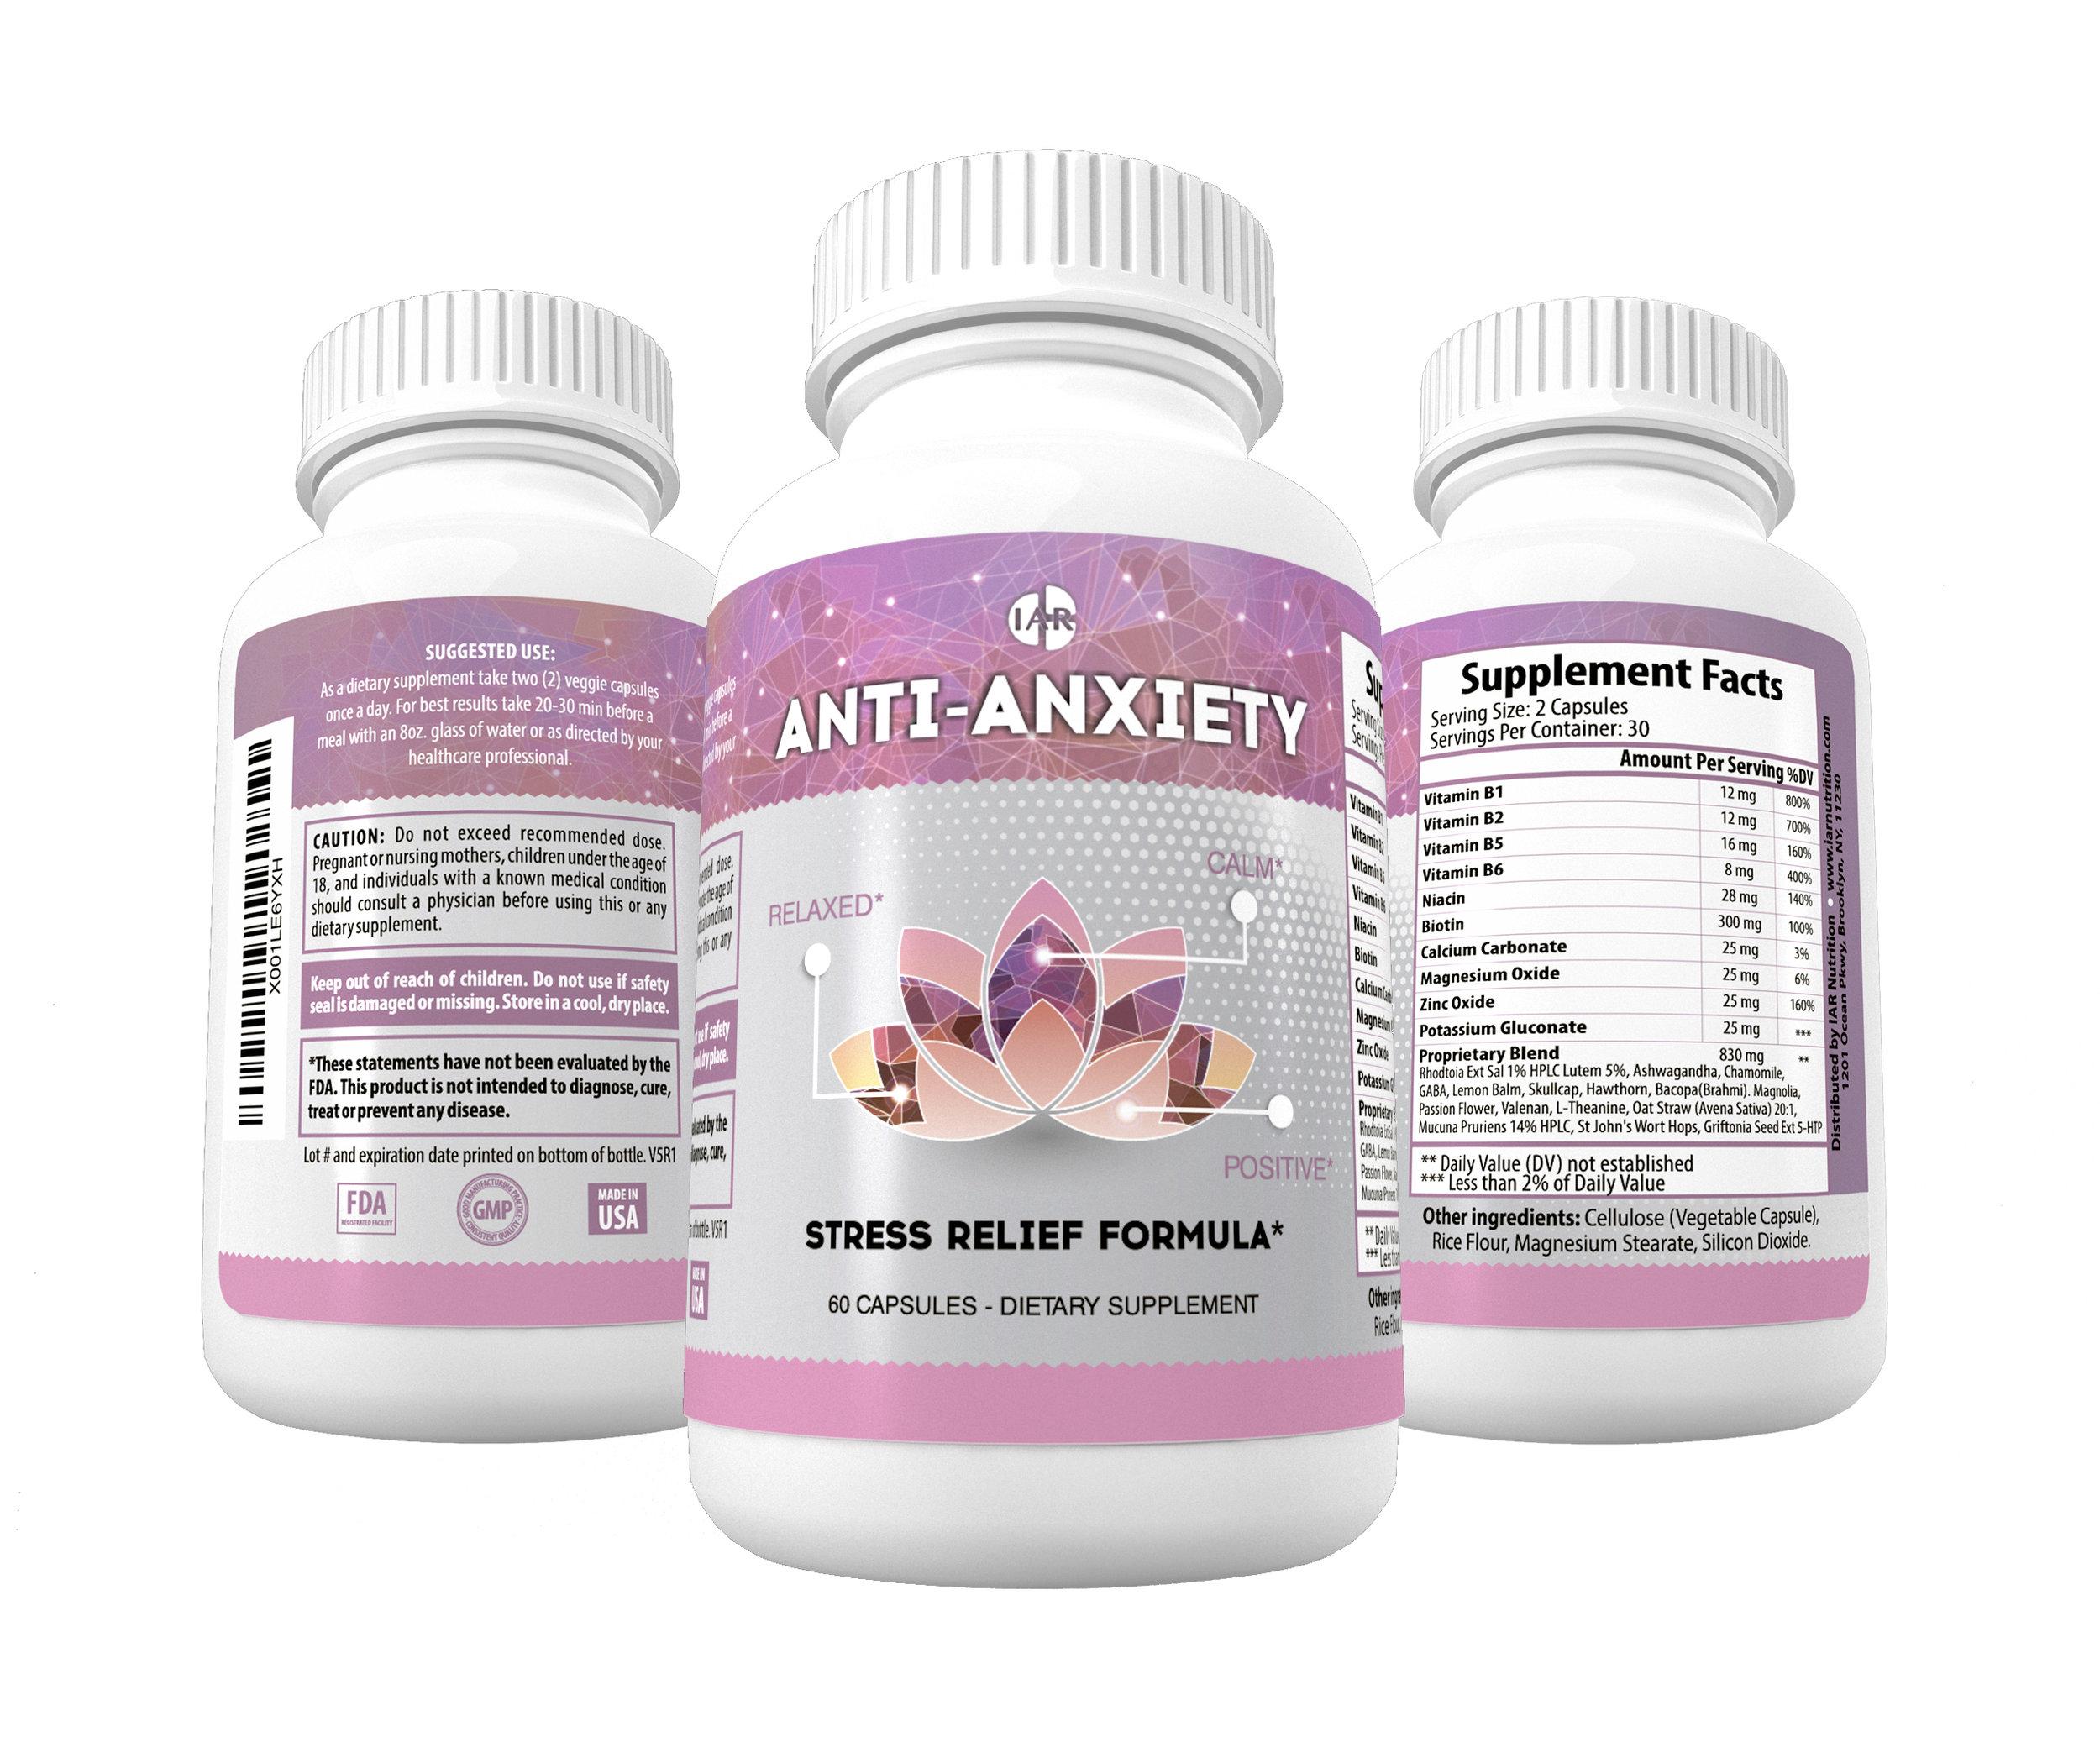 Anti-Anxiety